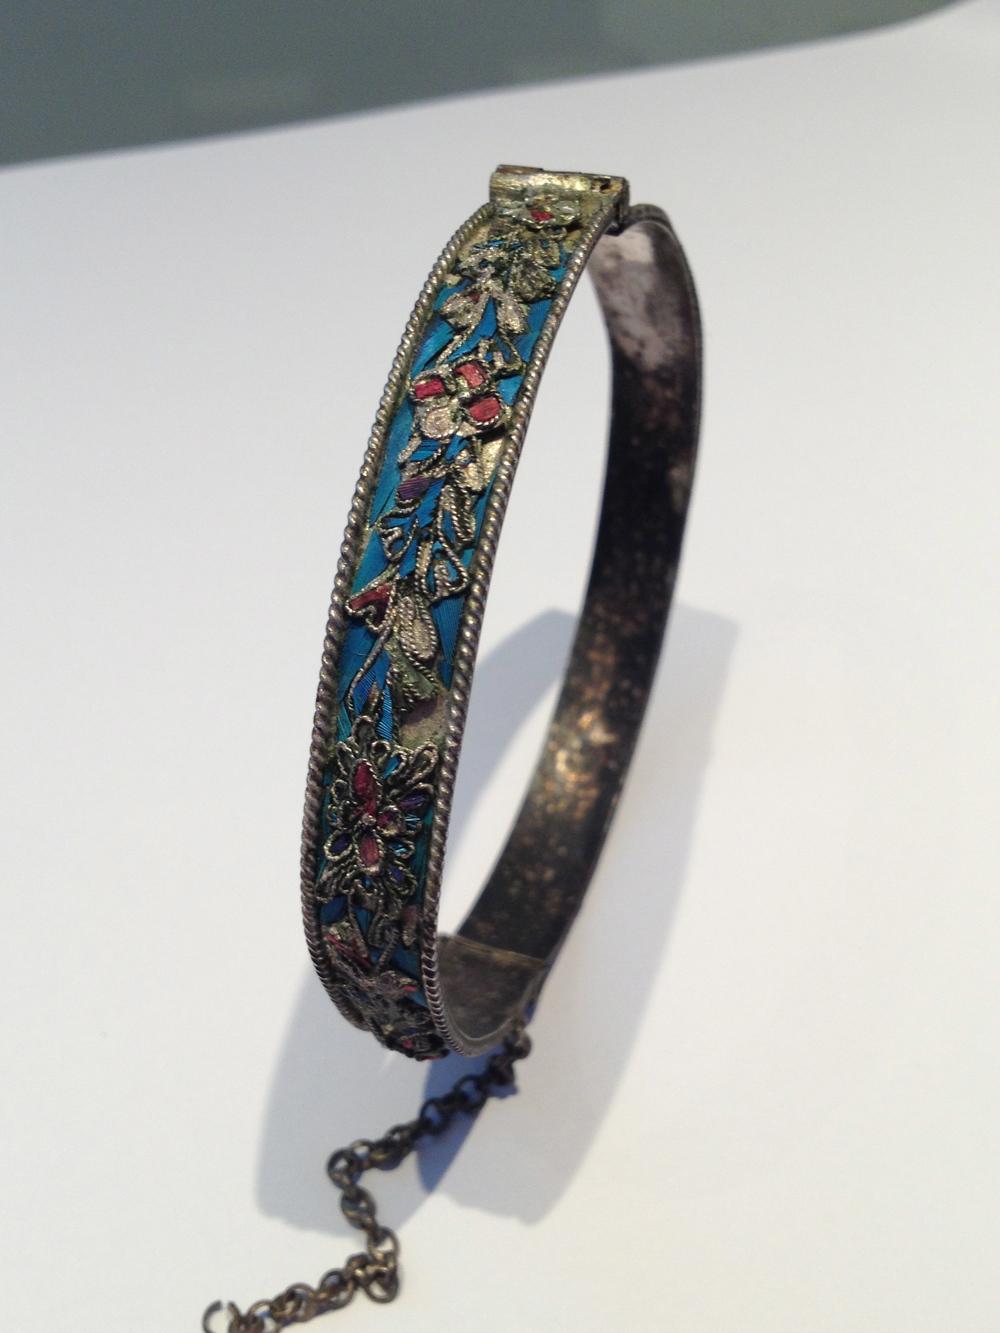 My Kingfisher inlay bangle